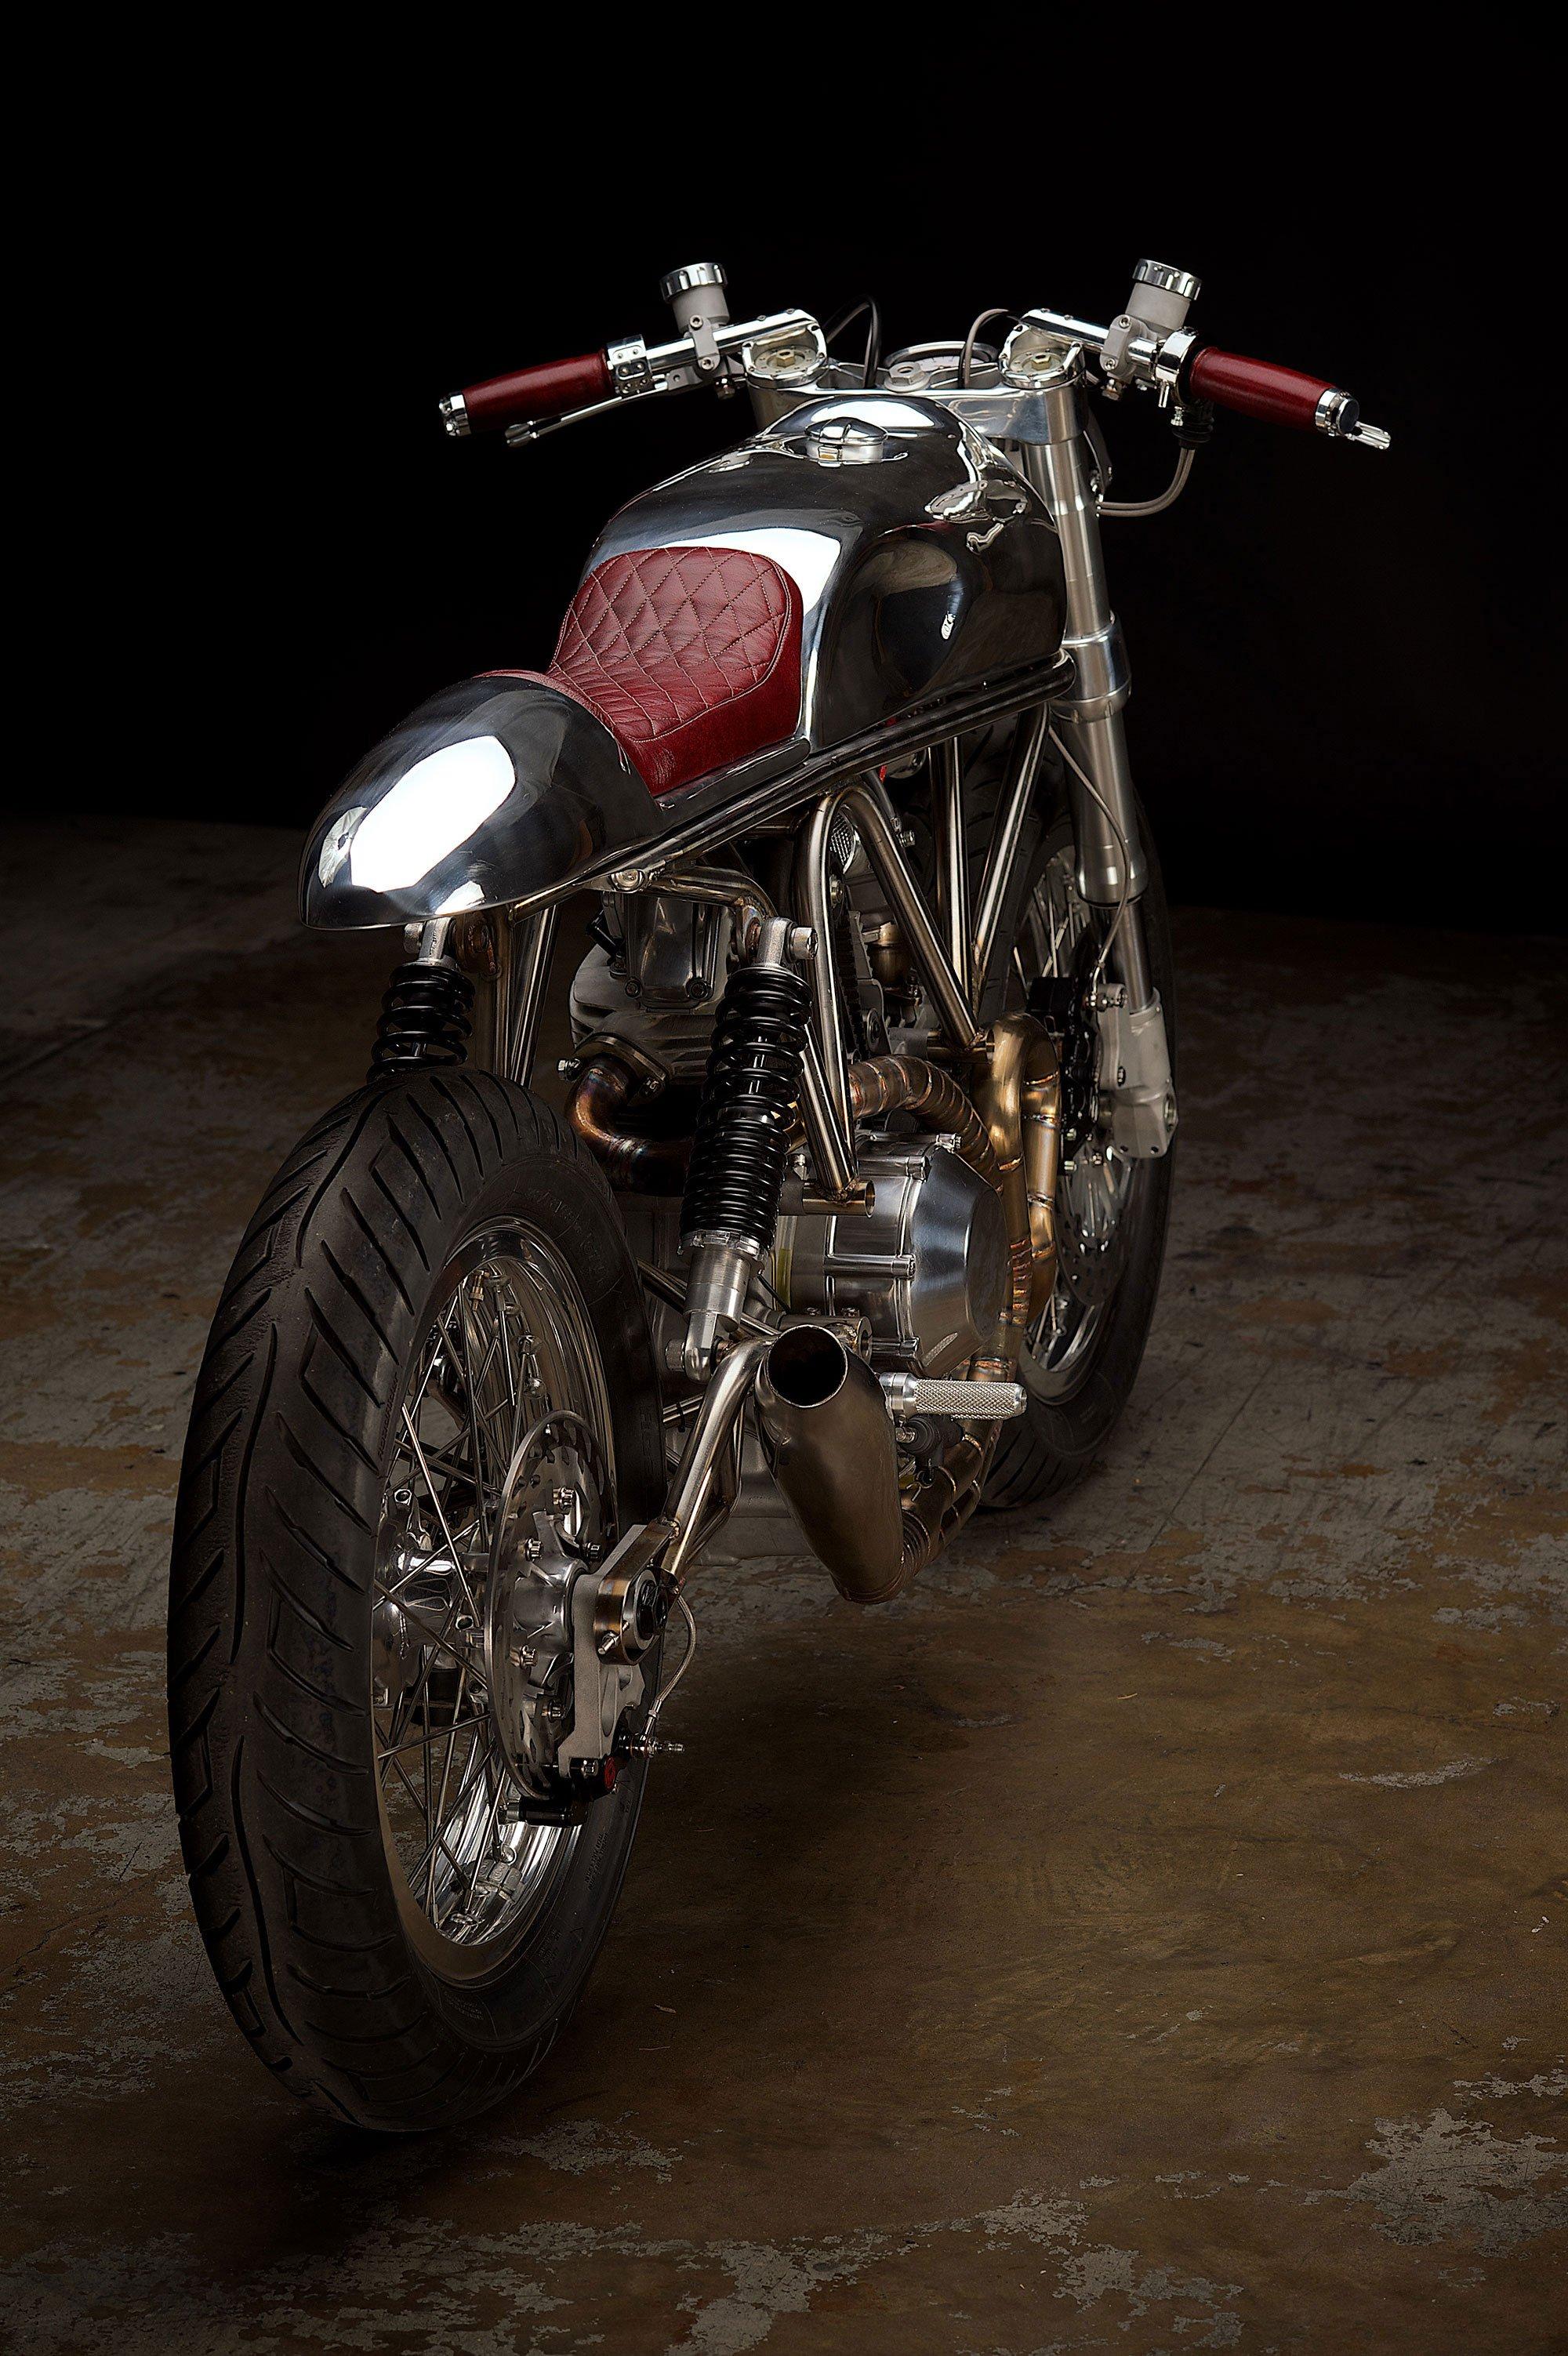 ducati-900ss-sp-j63-custom-build-by-revival-cycles-1